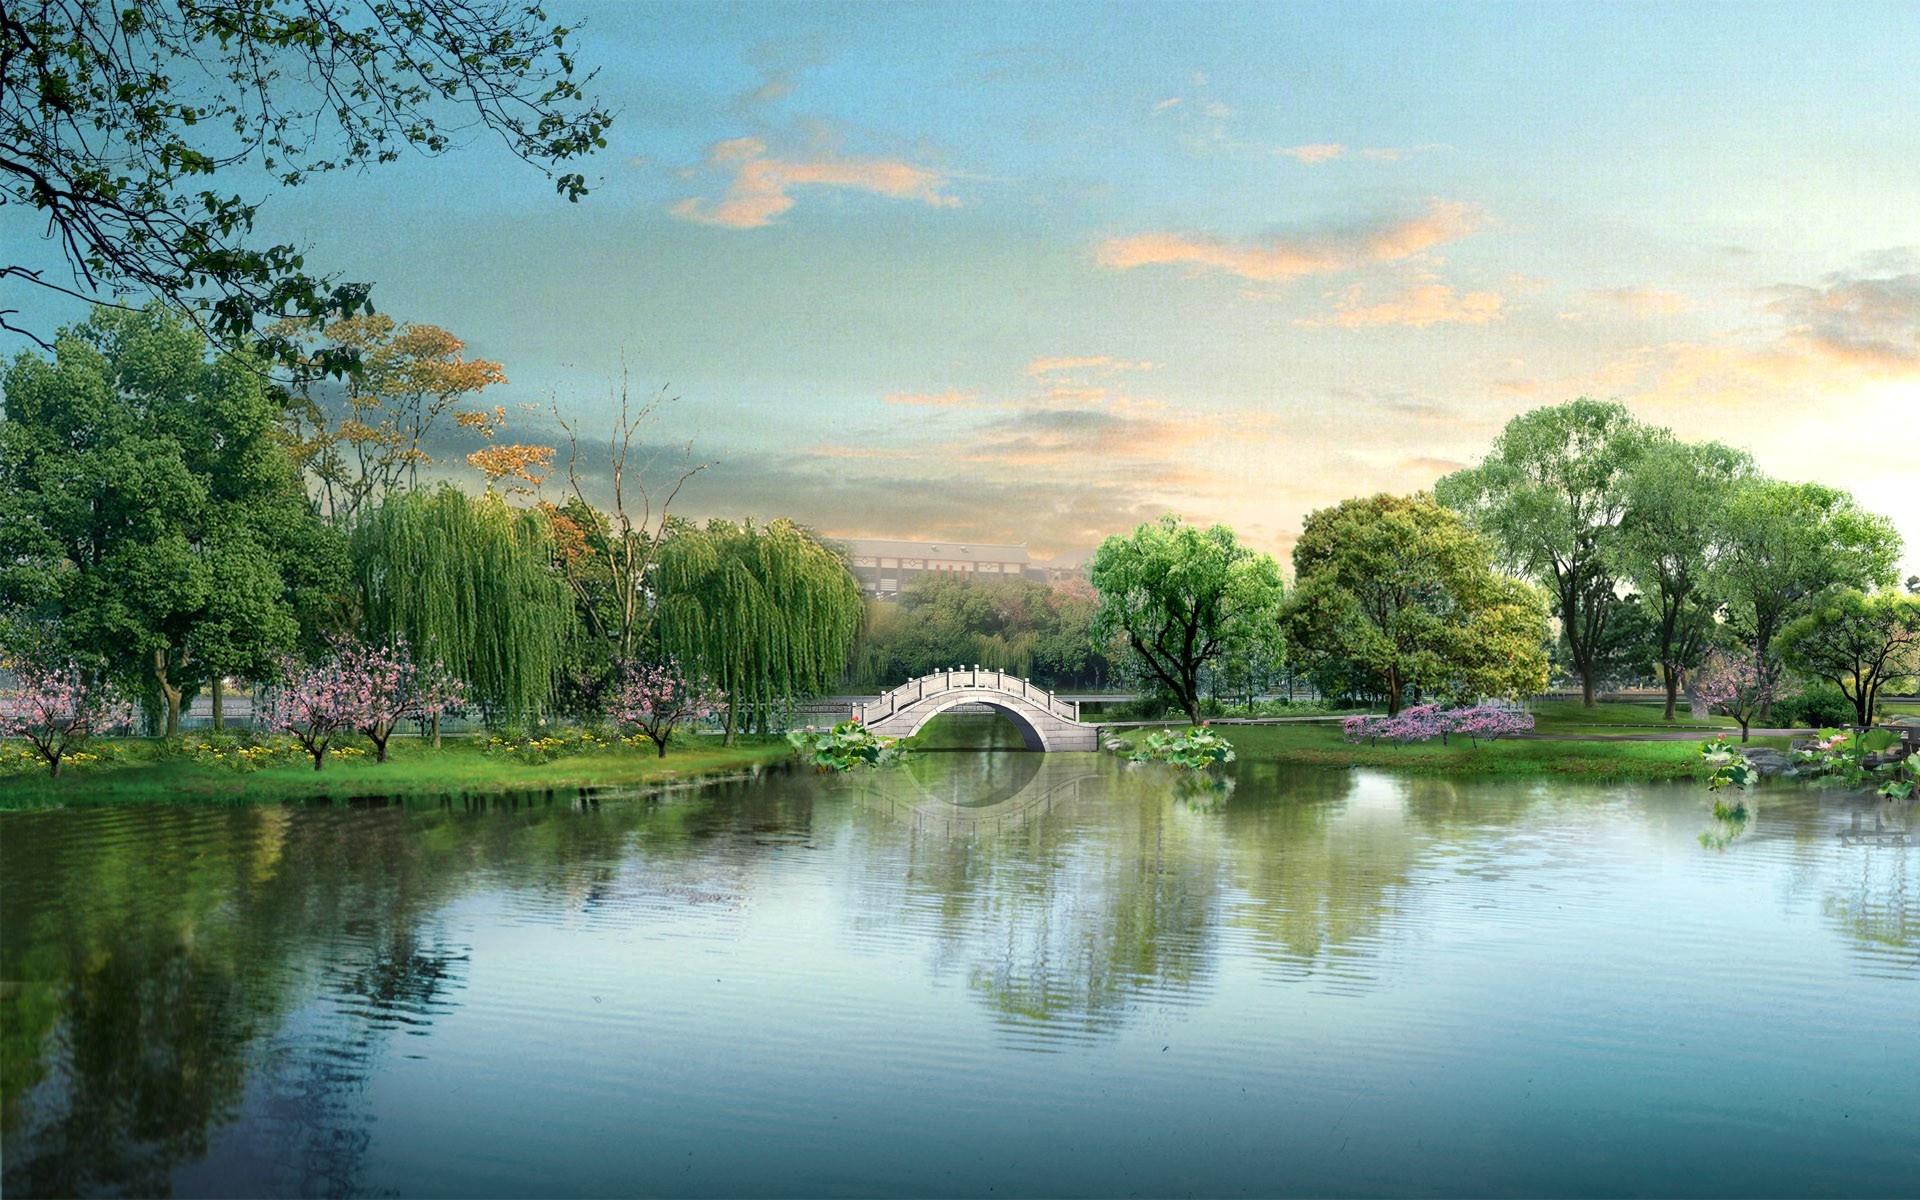 Widescreen Japan Digital Landscape Wallpapers In Jpg Format For Free